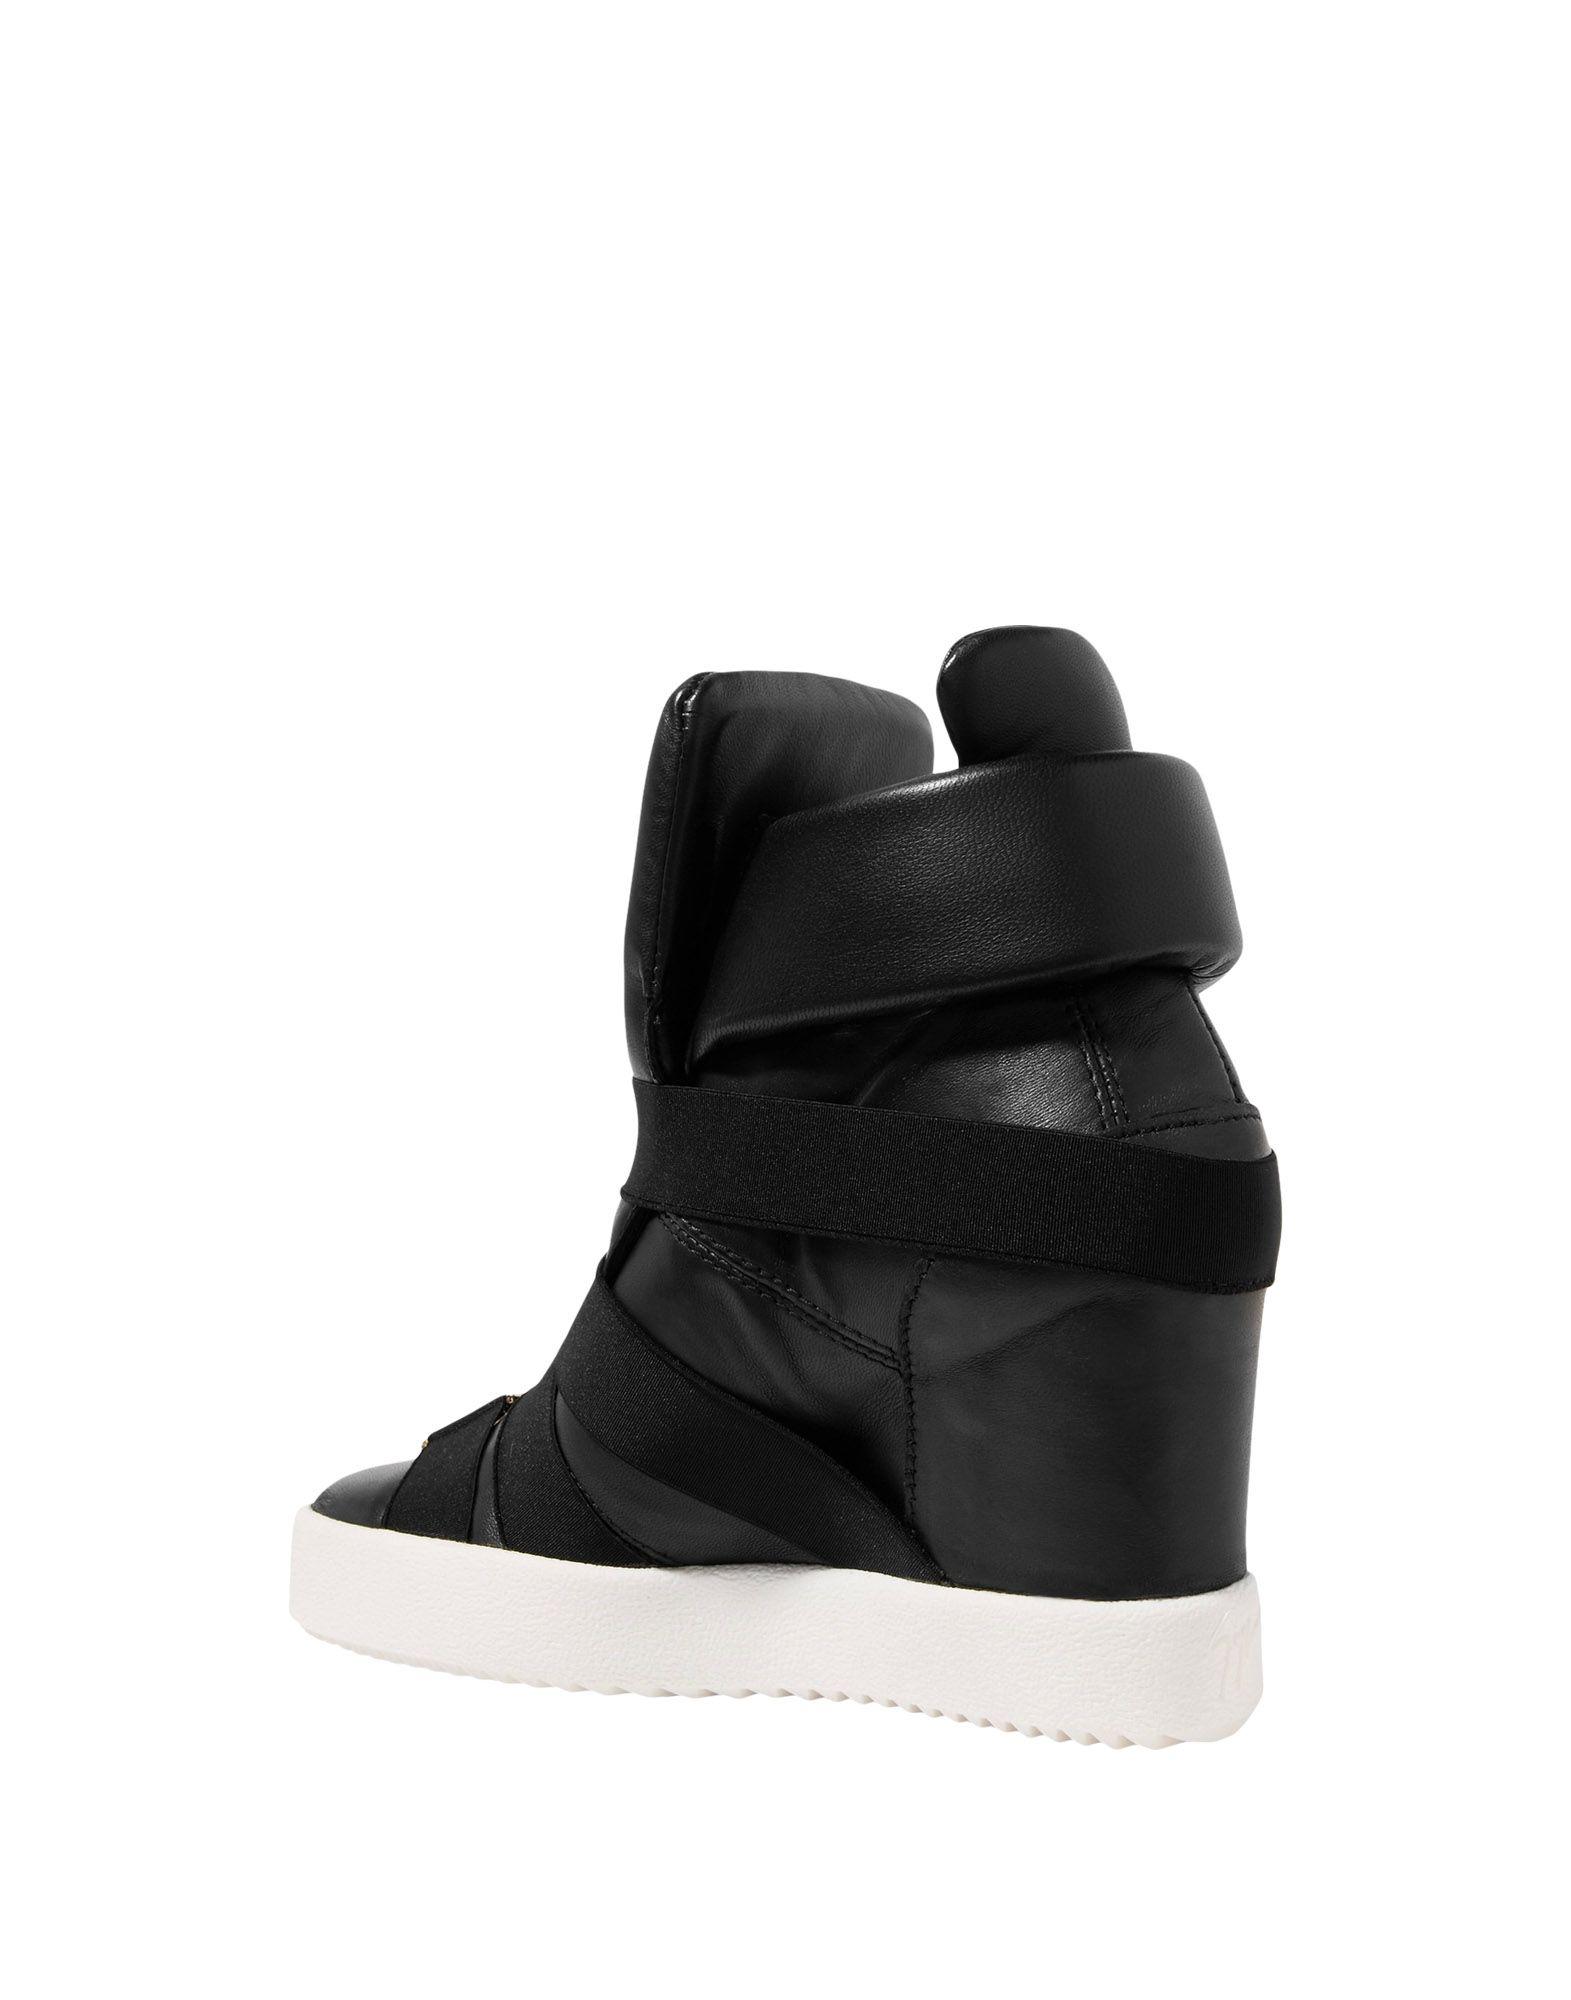 Giuseppe Zanotti gut Sneakers Damen  11515028RGGünstige gut Zanotti aussehende Schuhe b2f2e3